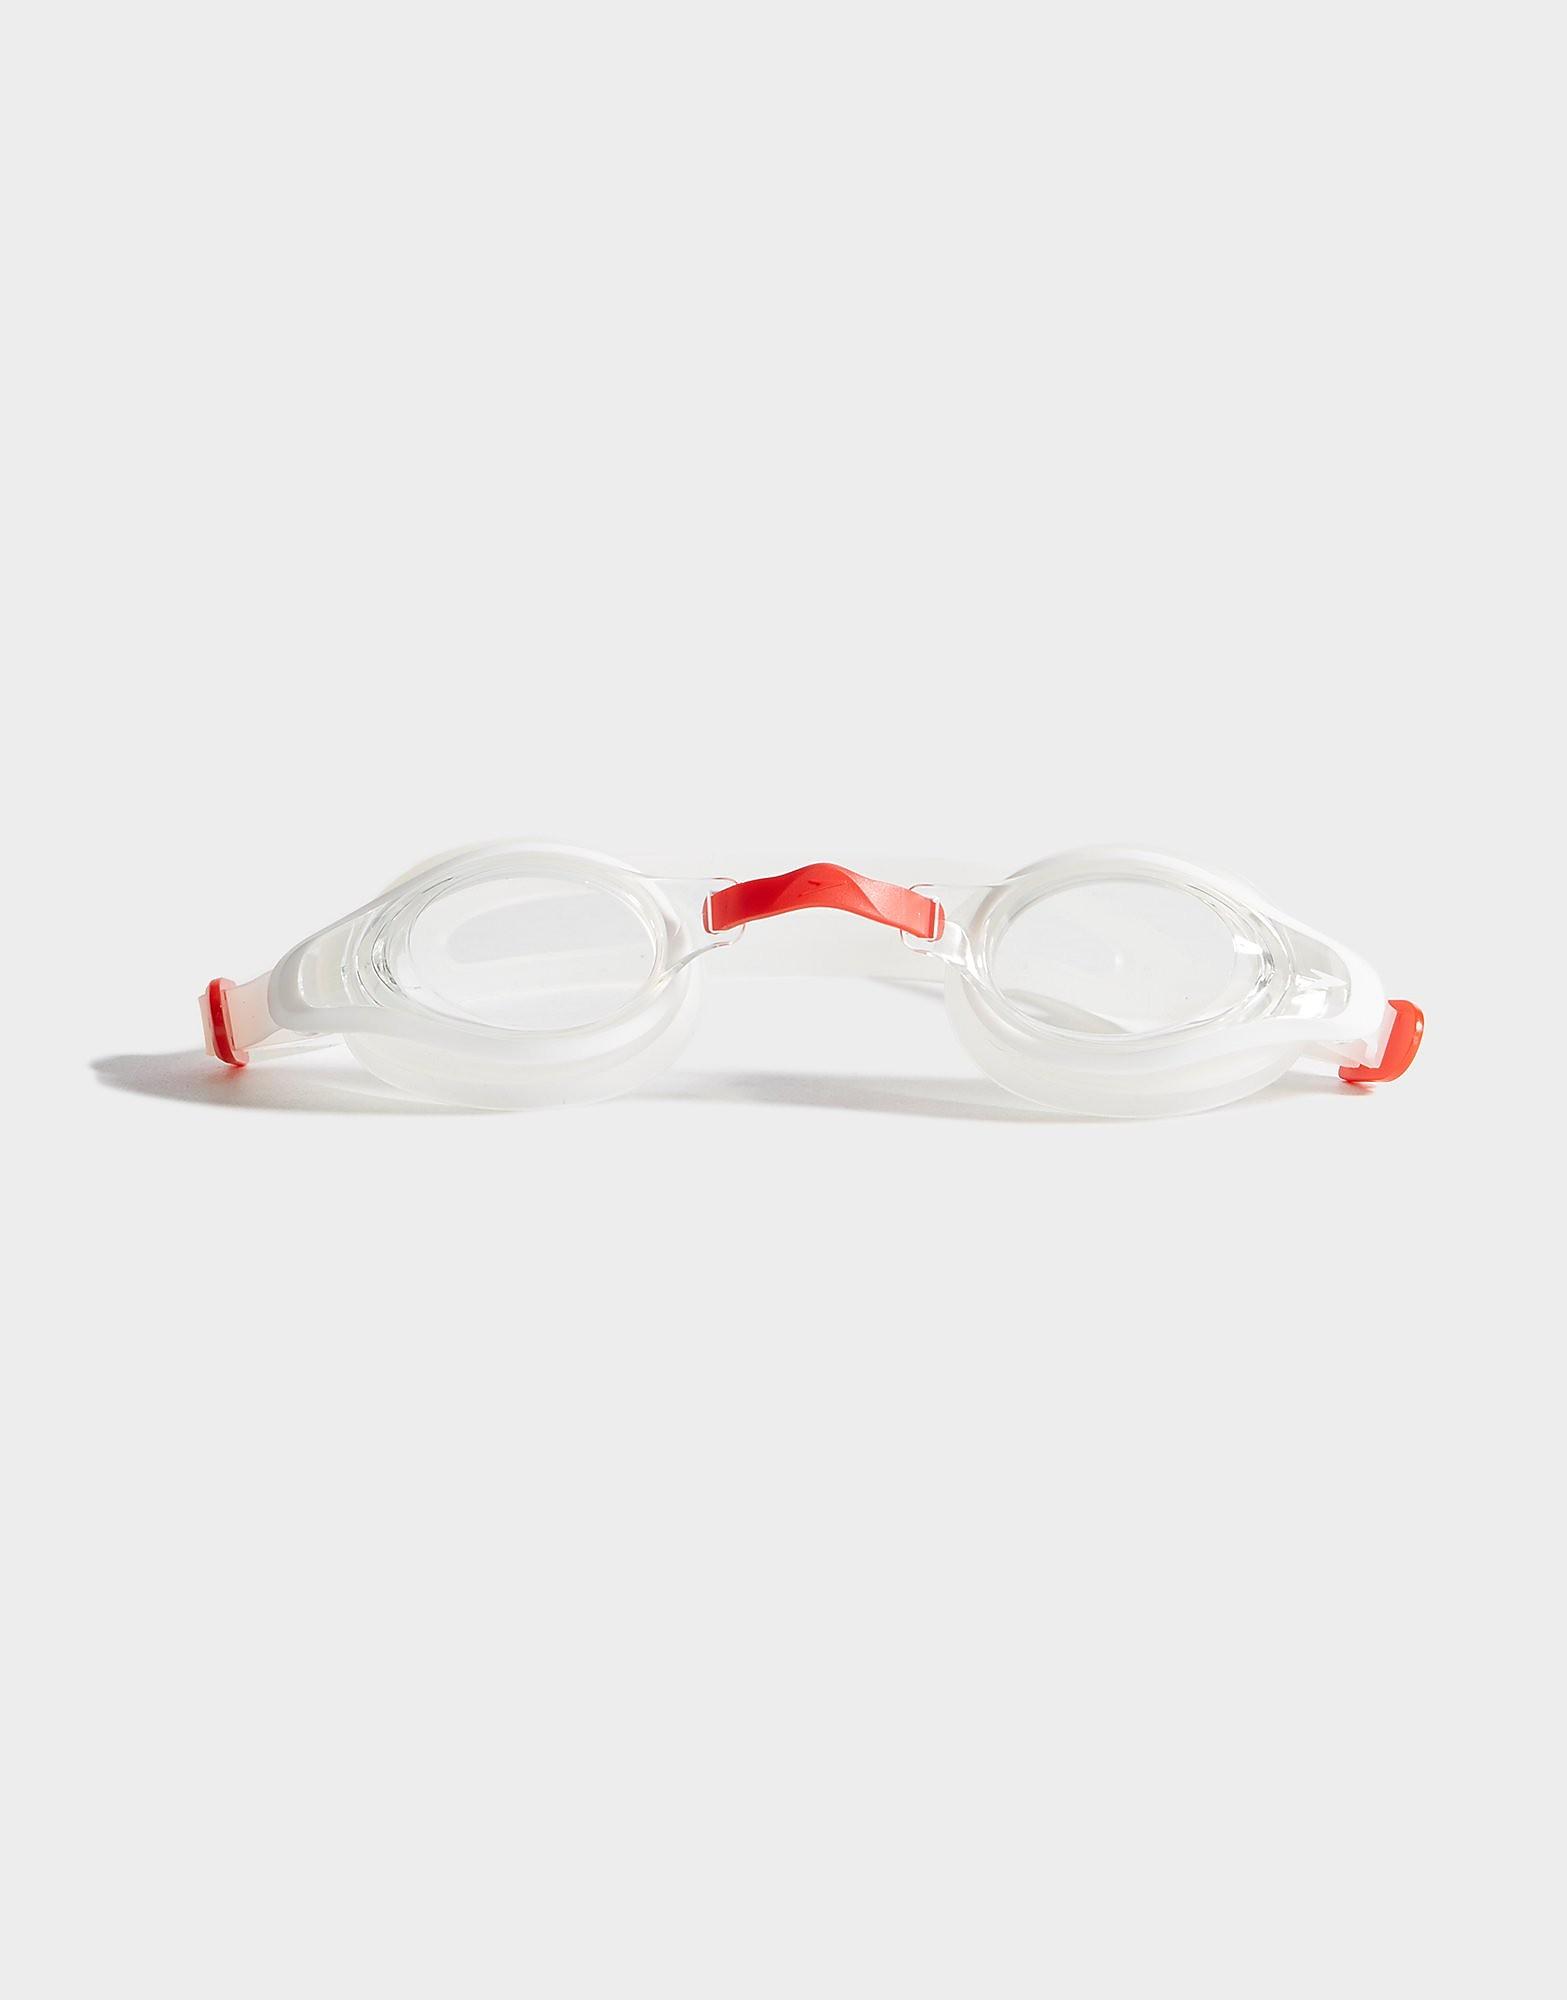 Speedo gafas de natación Mariner júnior